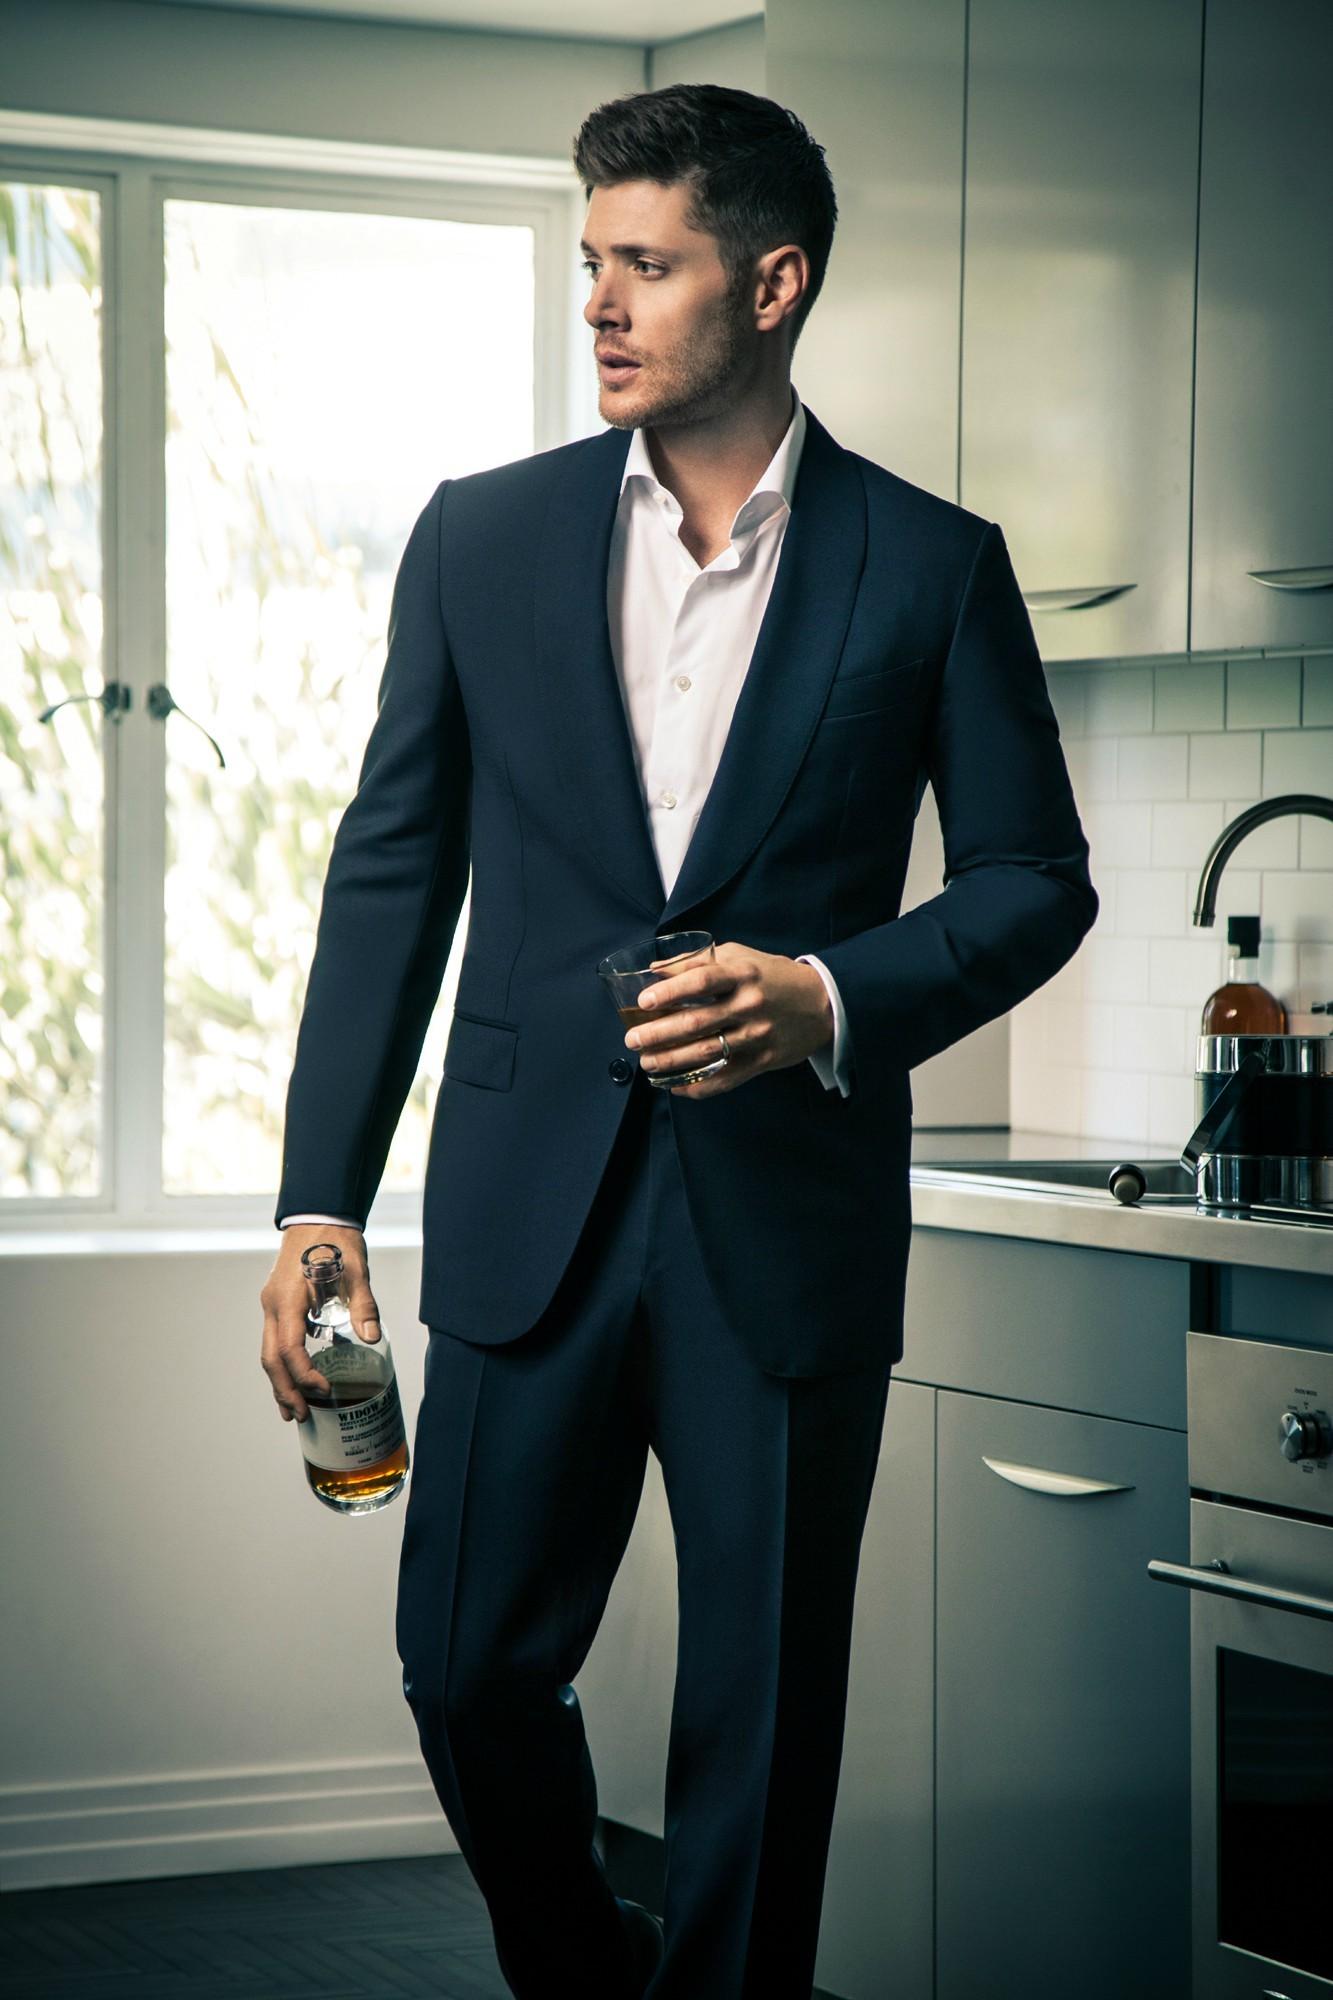 ДЖЕНСЕН ЭКЛЗ - Страница 6 Celeber-ru-Jensen-Ackles-Harper-s-Bazaar-CH-Magazine-Photoshoot-2014-03